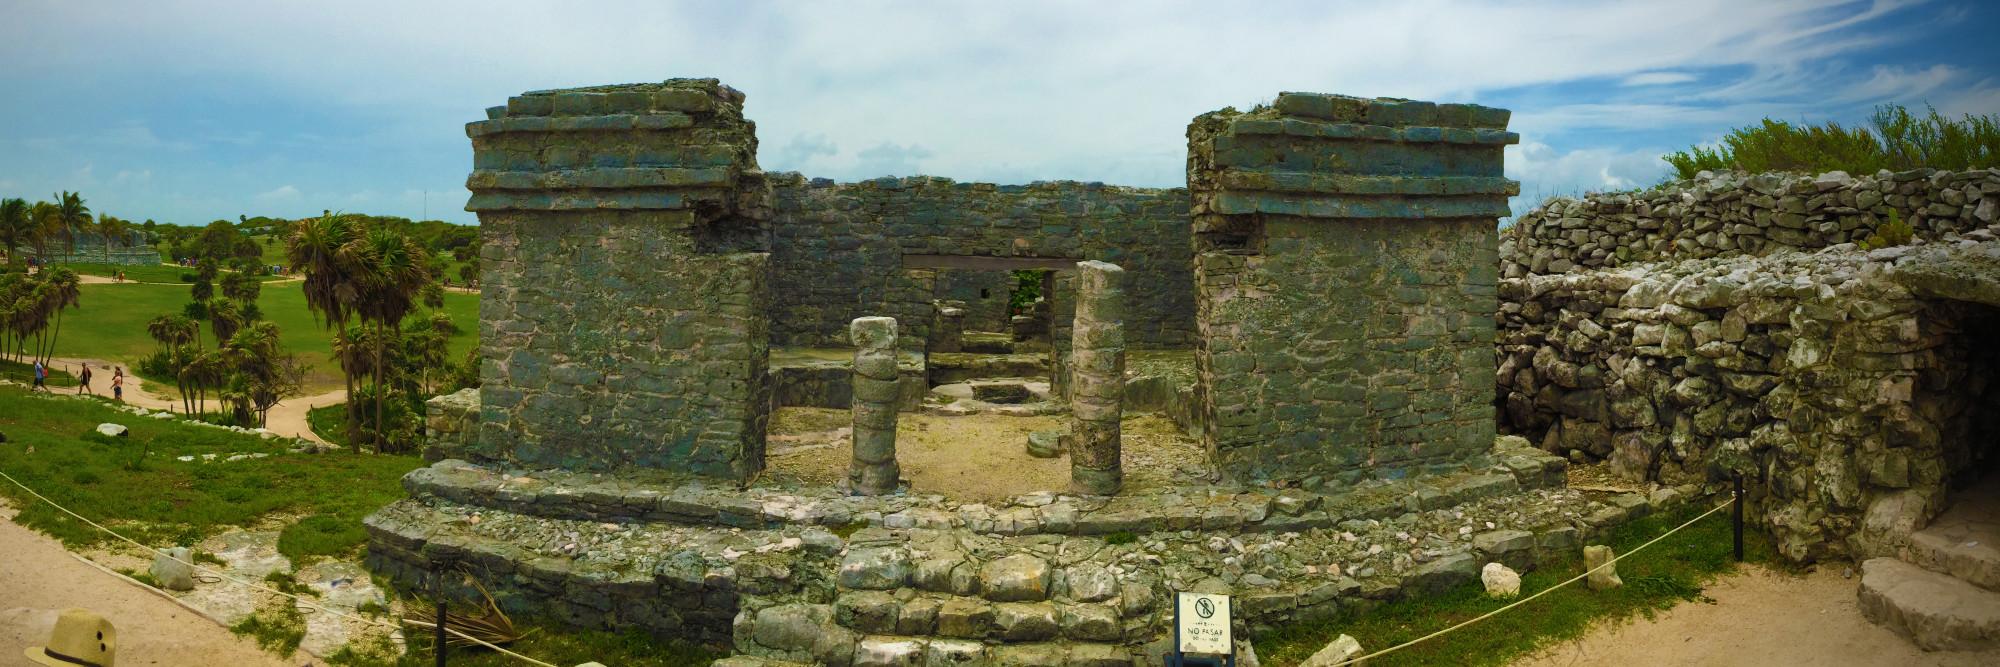 Cozumel Mayan Ruins Tulum